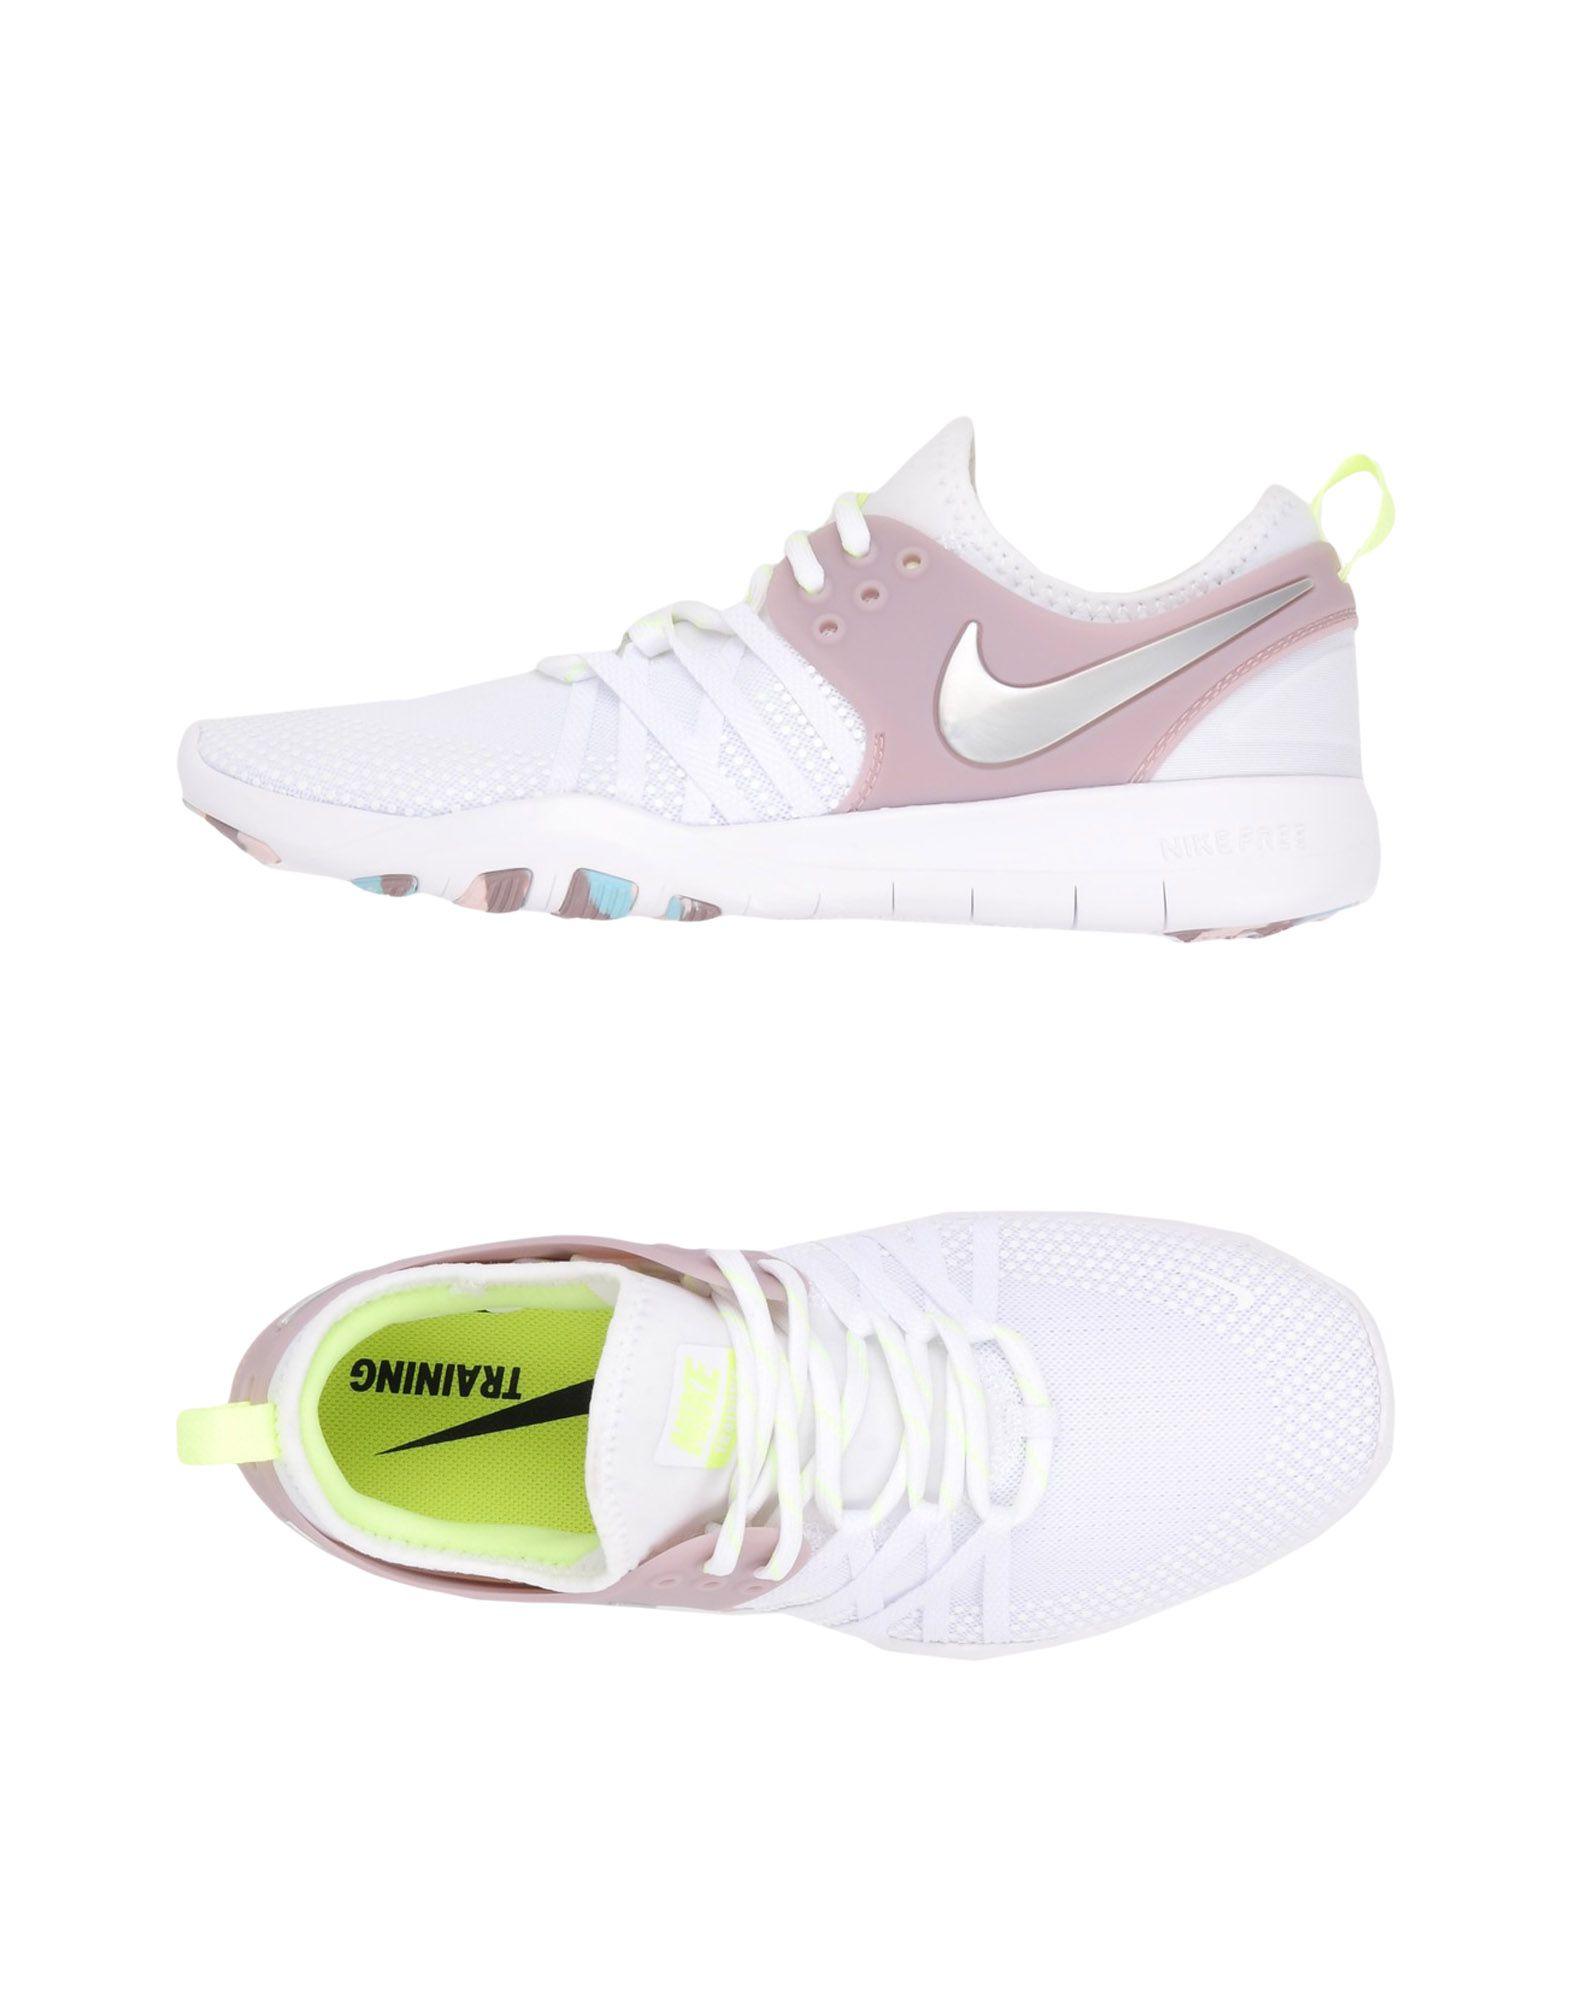 Nike   Free Tr 7   7 11438319KU Gute Qualität beliebte Schuhe 5edef2